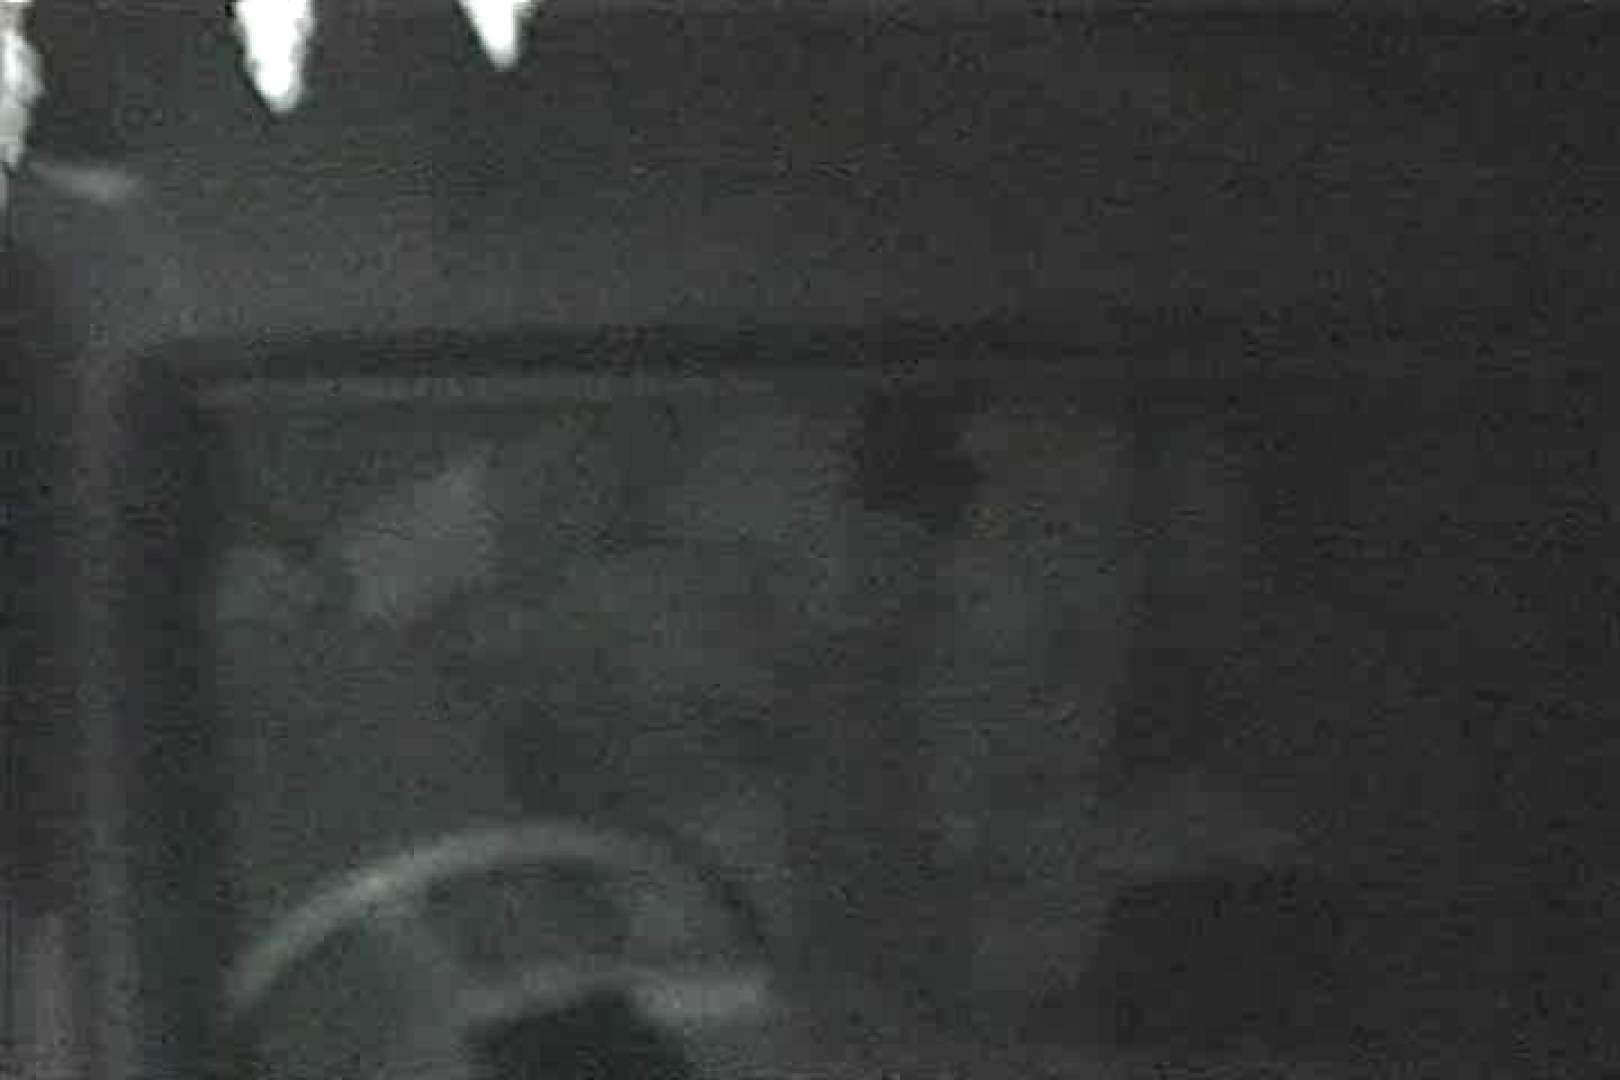 MASAさんの待ち伏せ撮り! 赤外線カーセックスVol.11 OLセックス 盗撮セックス無修正動画無料 81画像 38